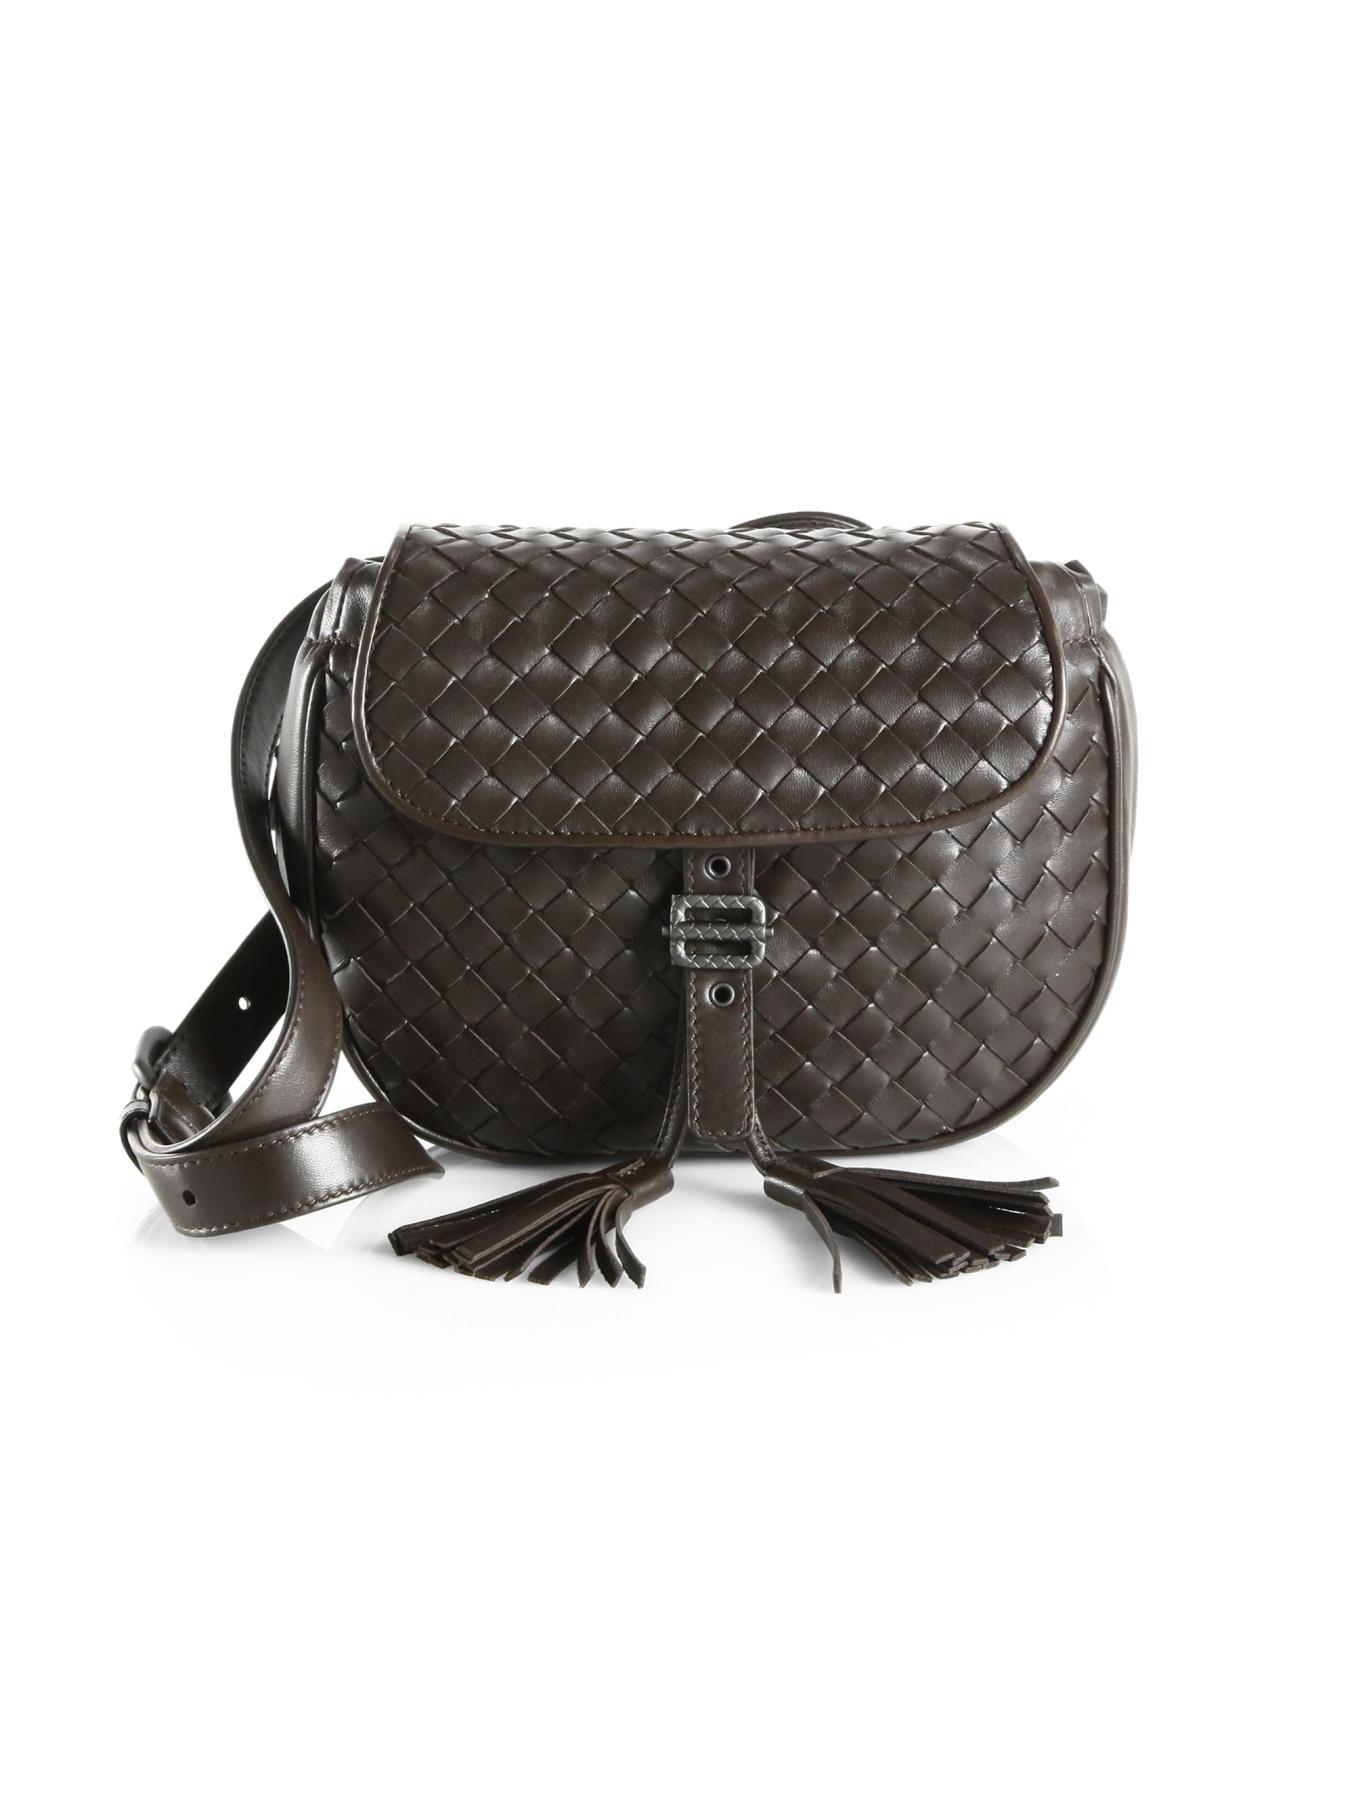 c76491bad551 Lyst - Bottega Veneta Small Woven Belt Bag in Brown